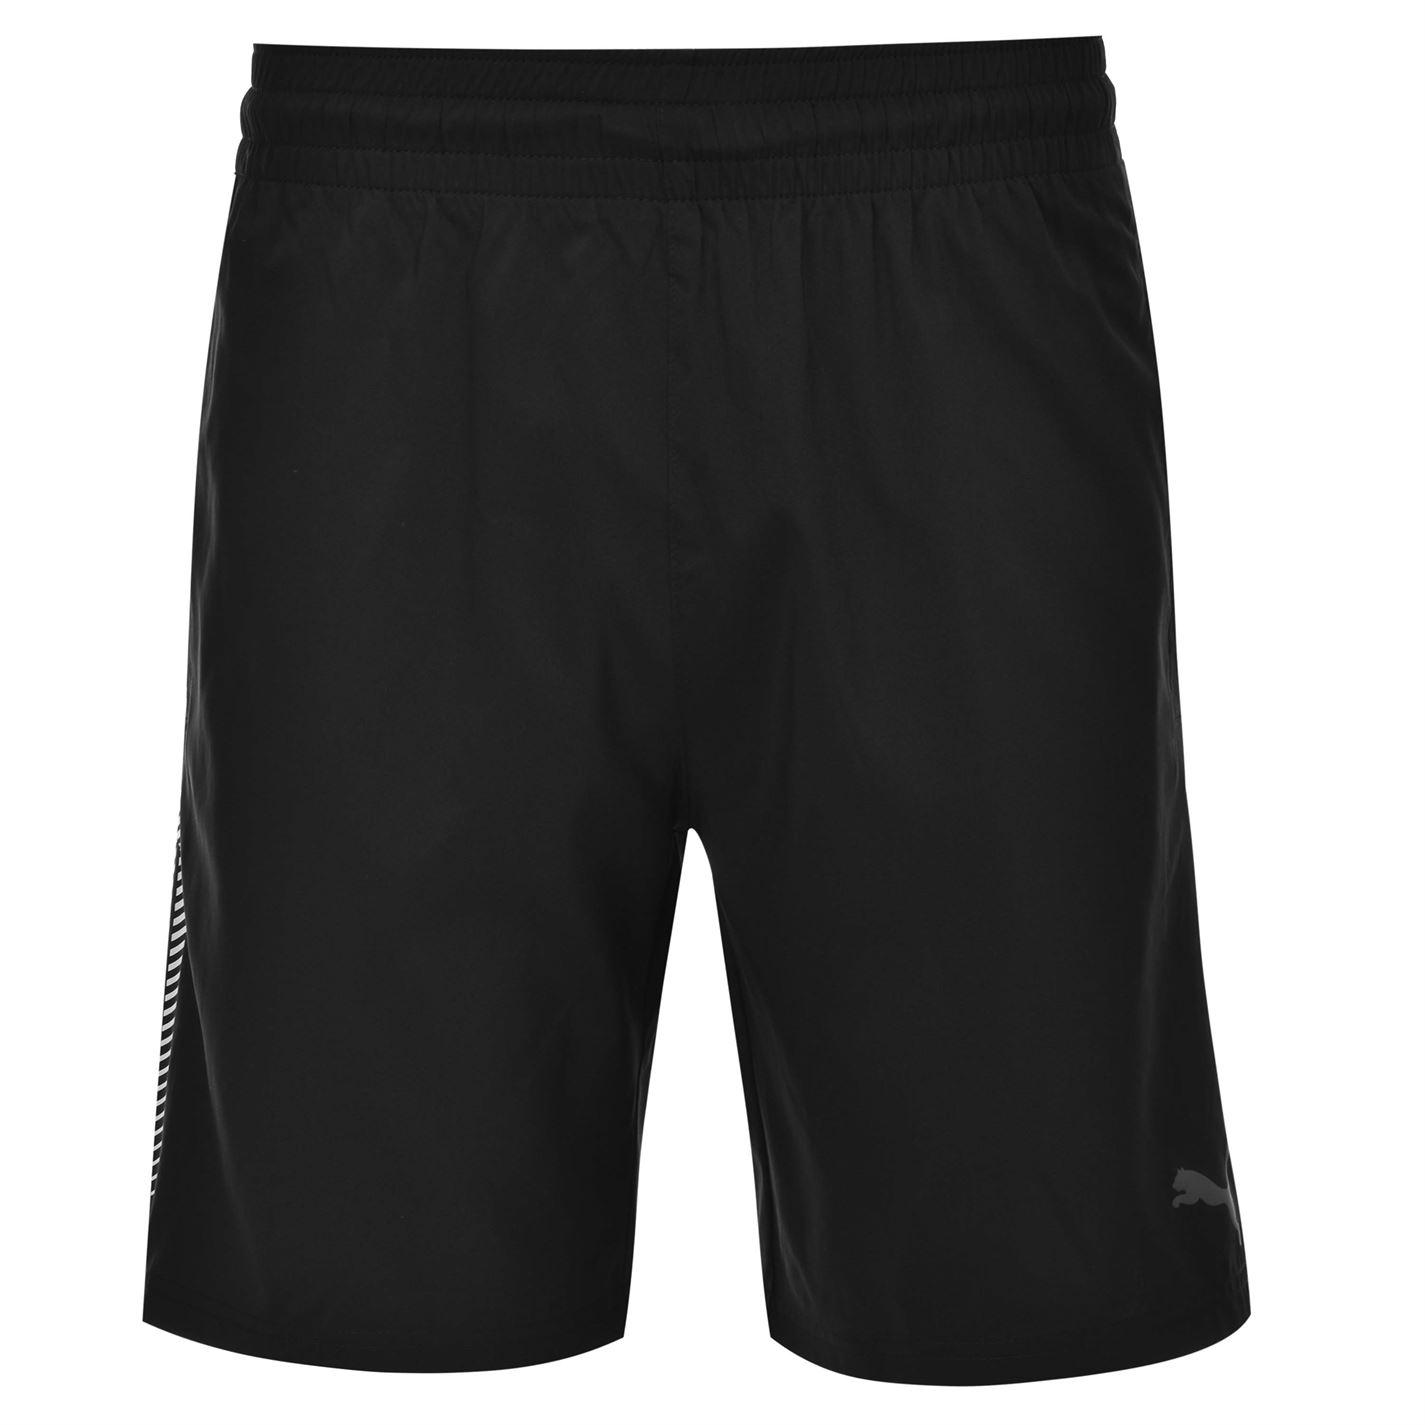 "Puma ACE Woven 9"" Mens Shorts"